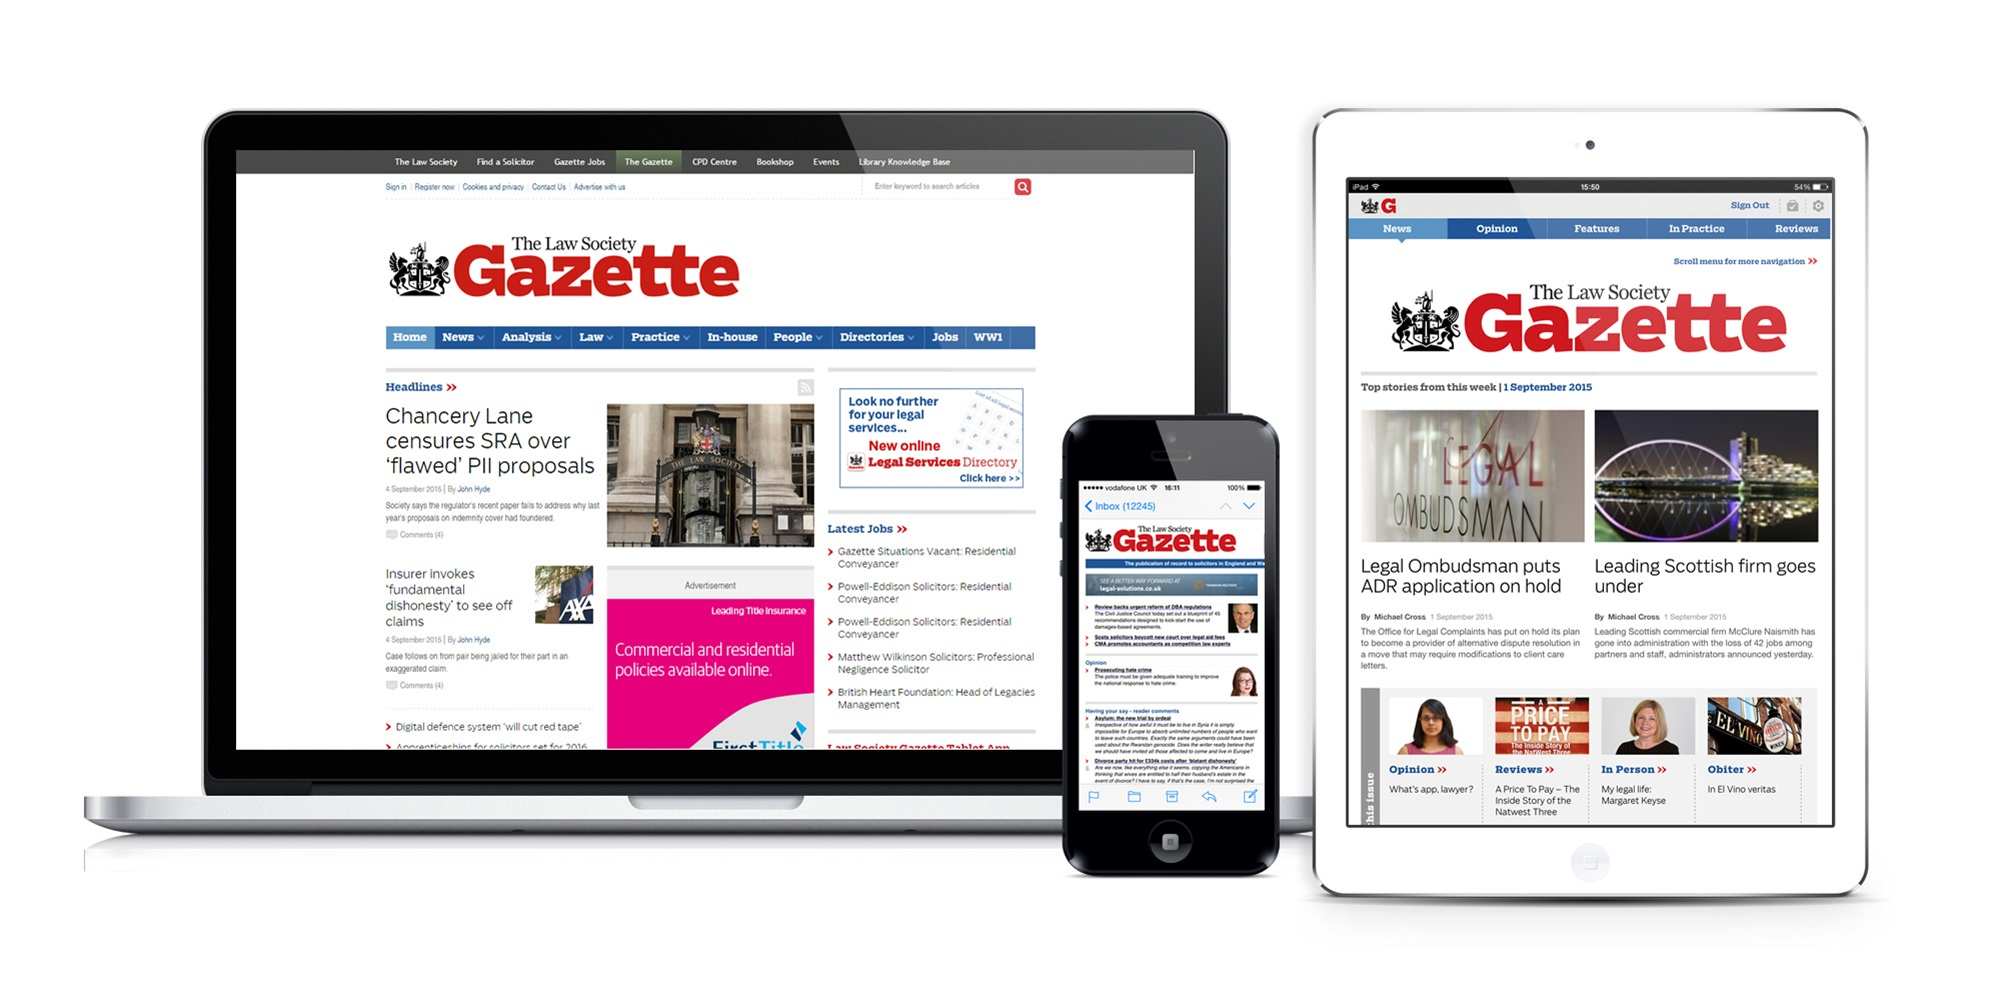 Law Society Gazette Digital Products